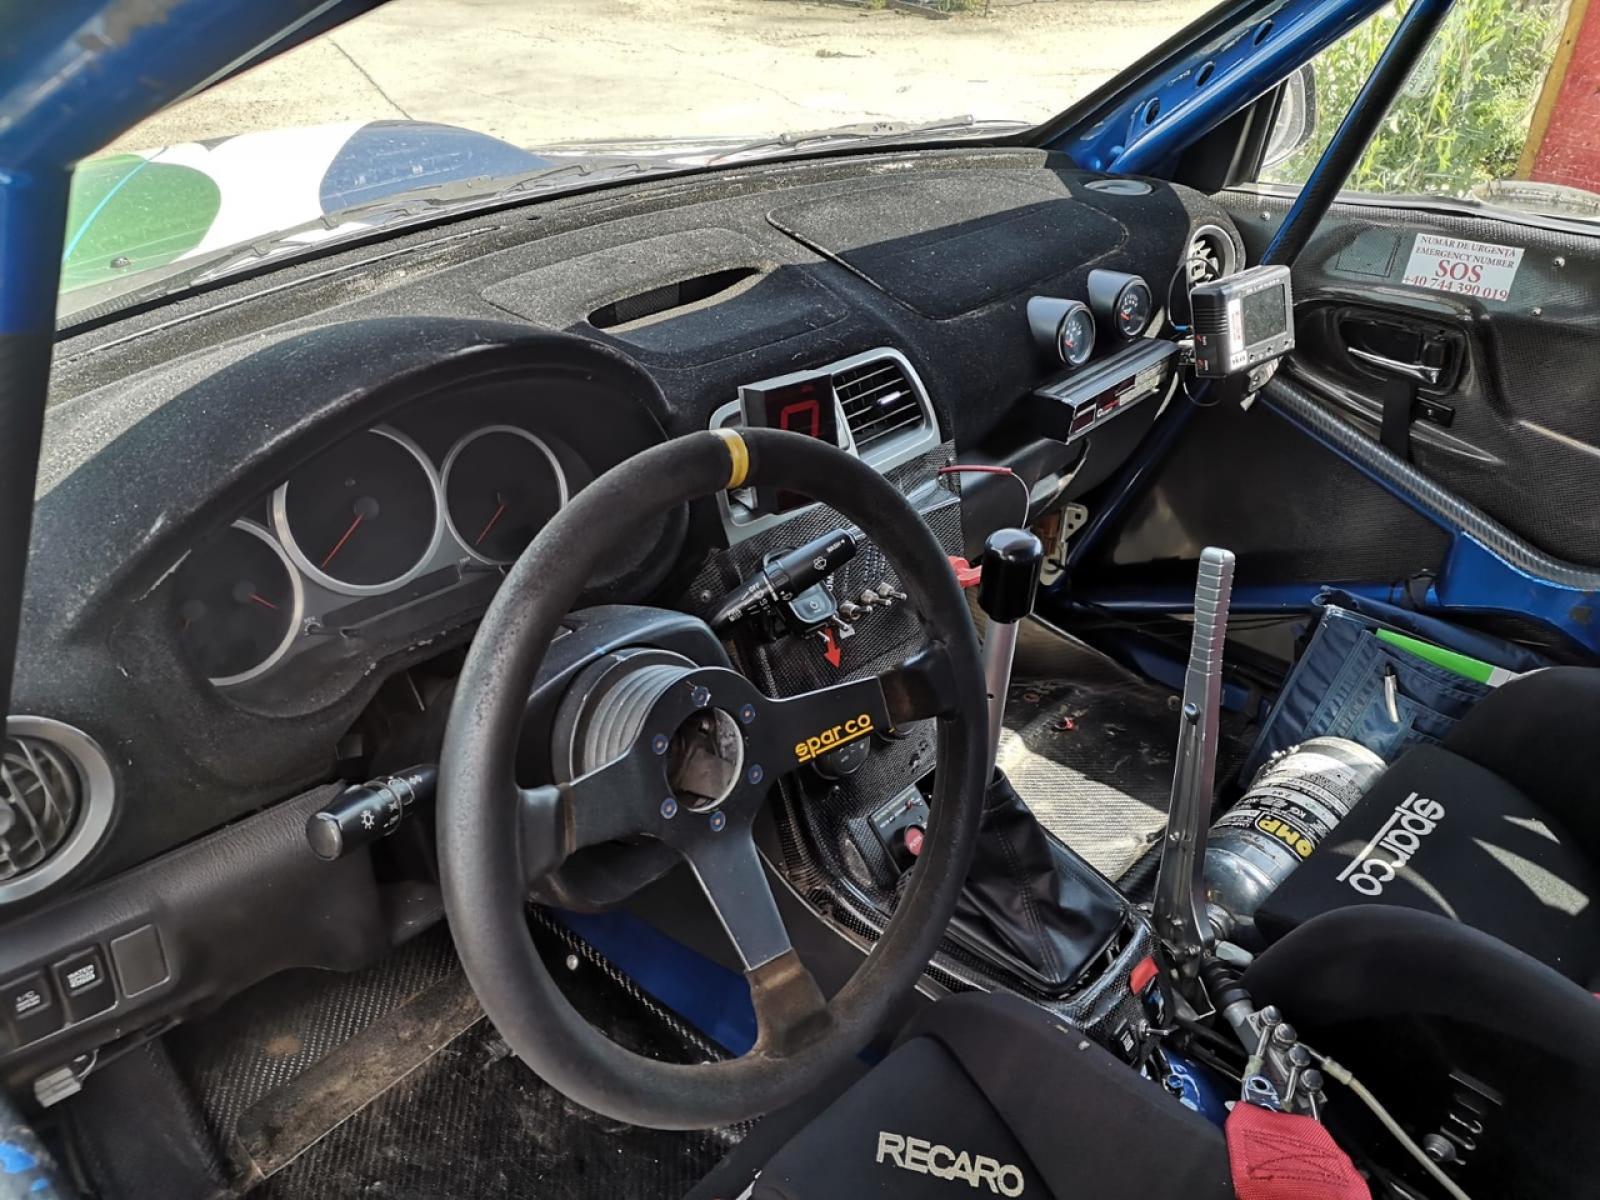 Subaru Impreza WRX STI N12 2.0L Engine - Tommi Makinen - OPEN CLASS - 1